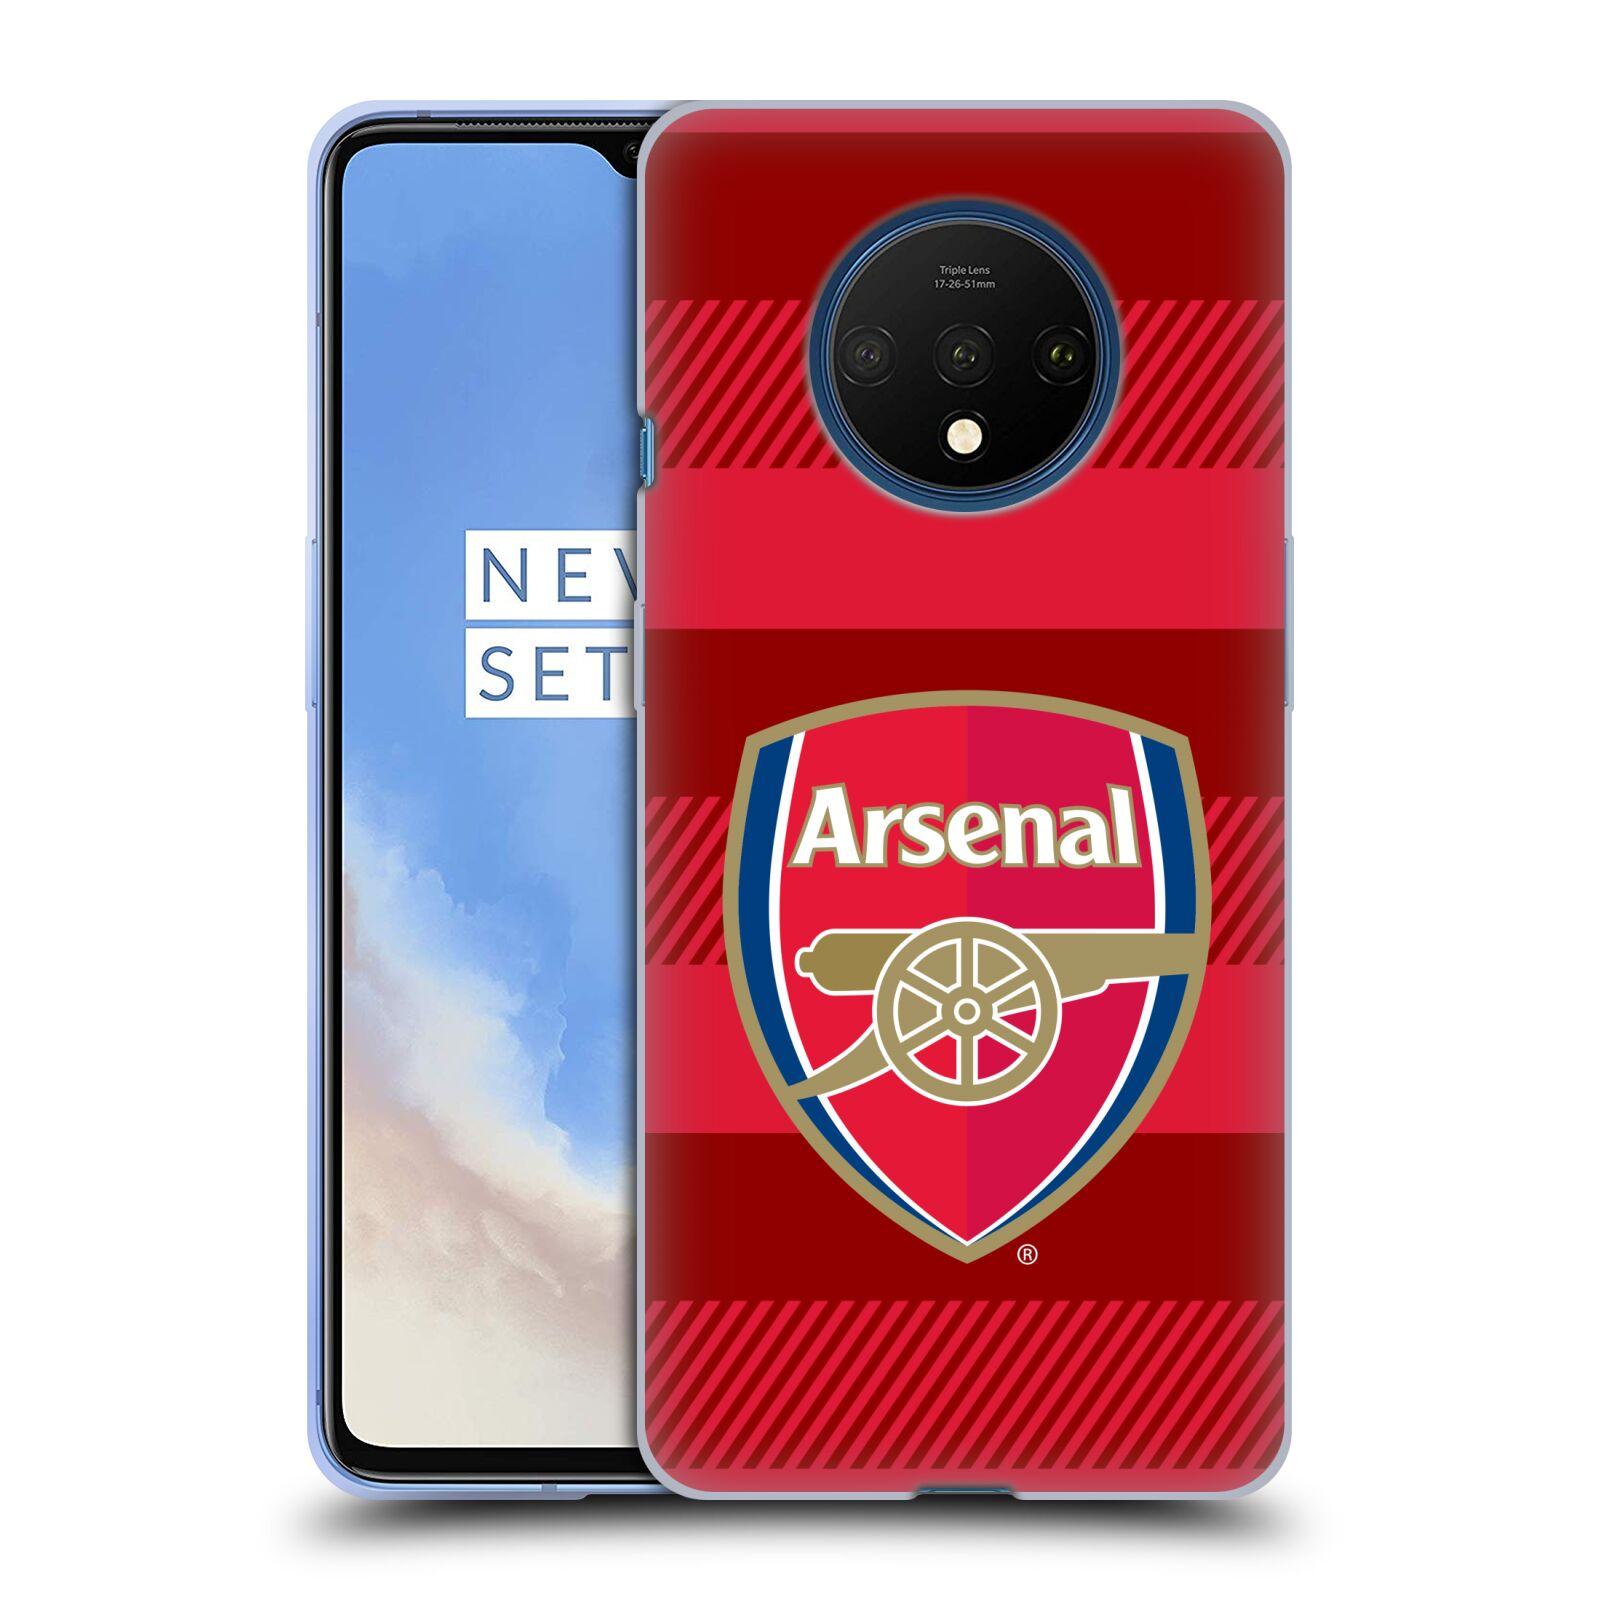 Silikonové pouzdro na mobil OnePlus 7T - Head Case - Arsenal FC - Logo s pruhy